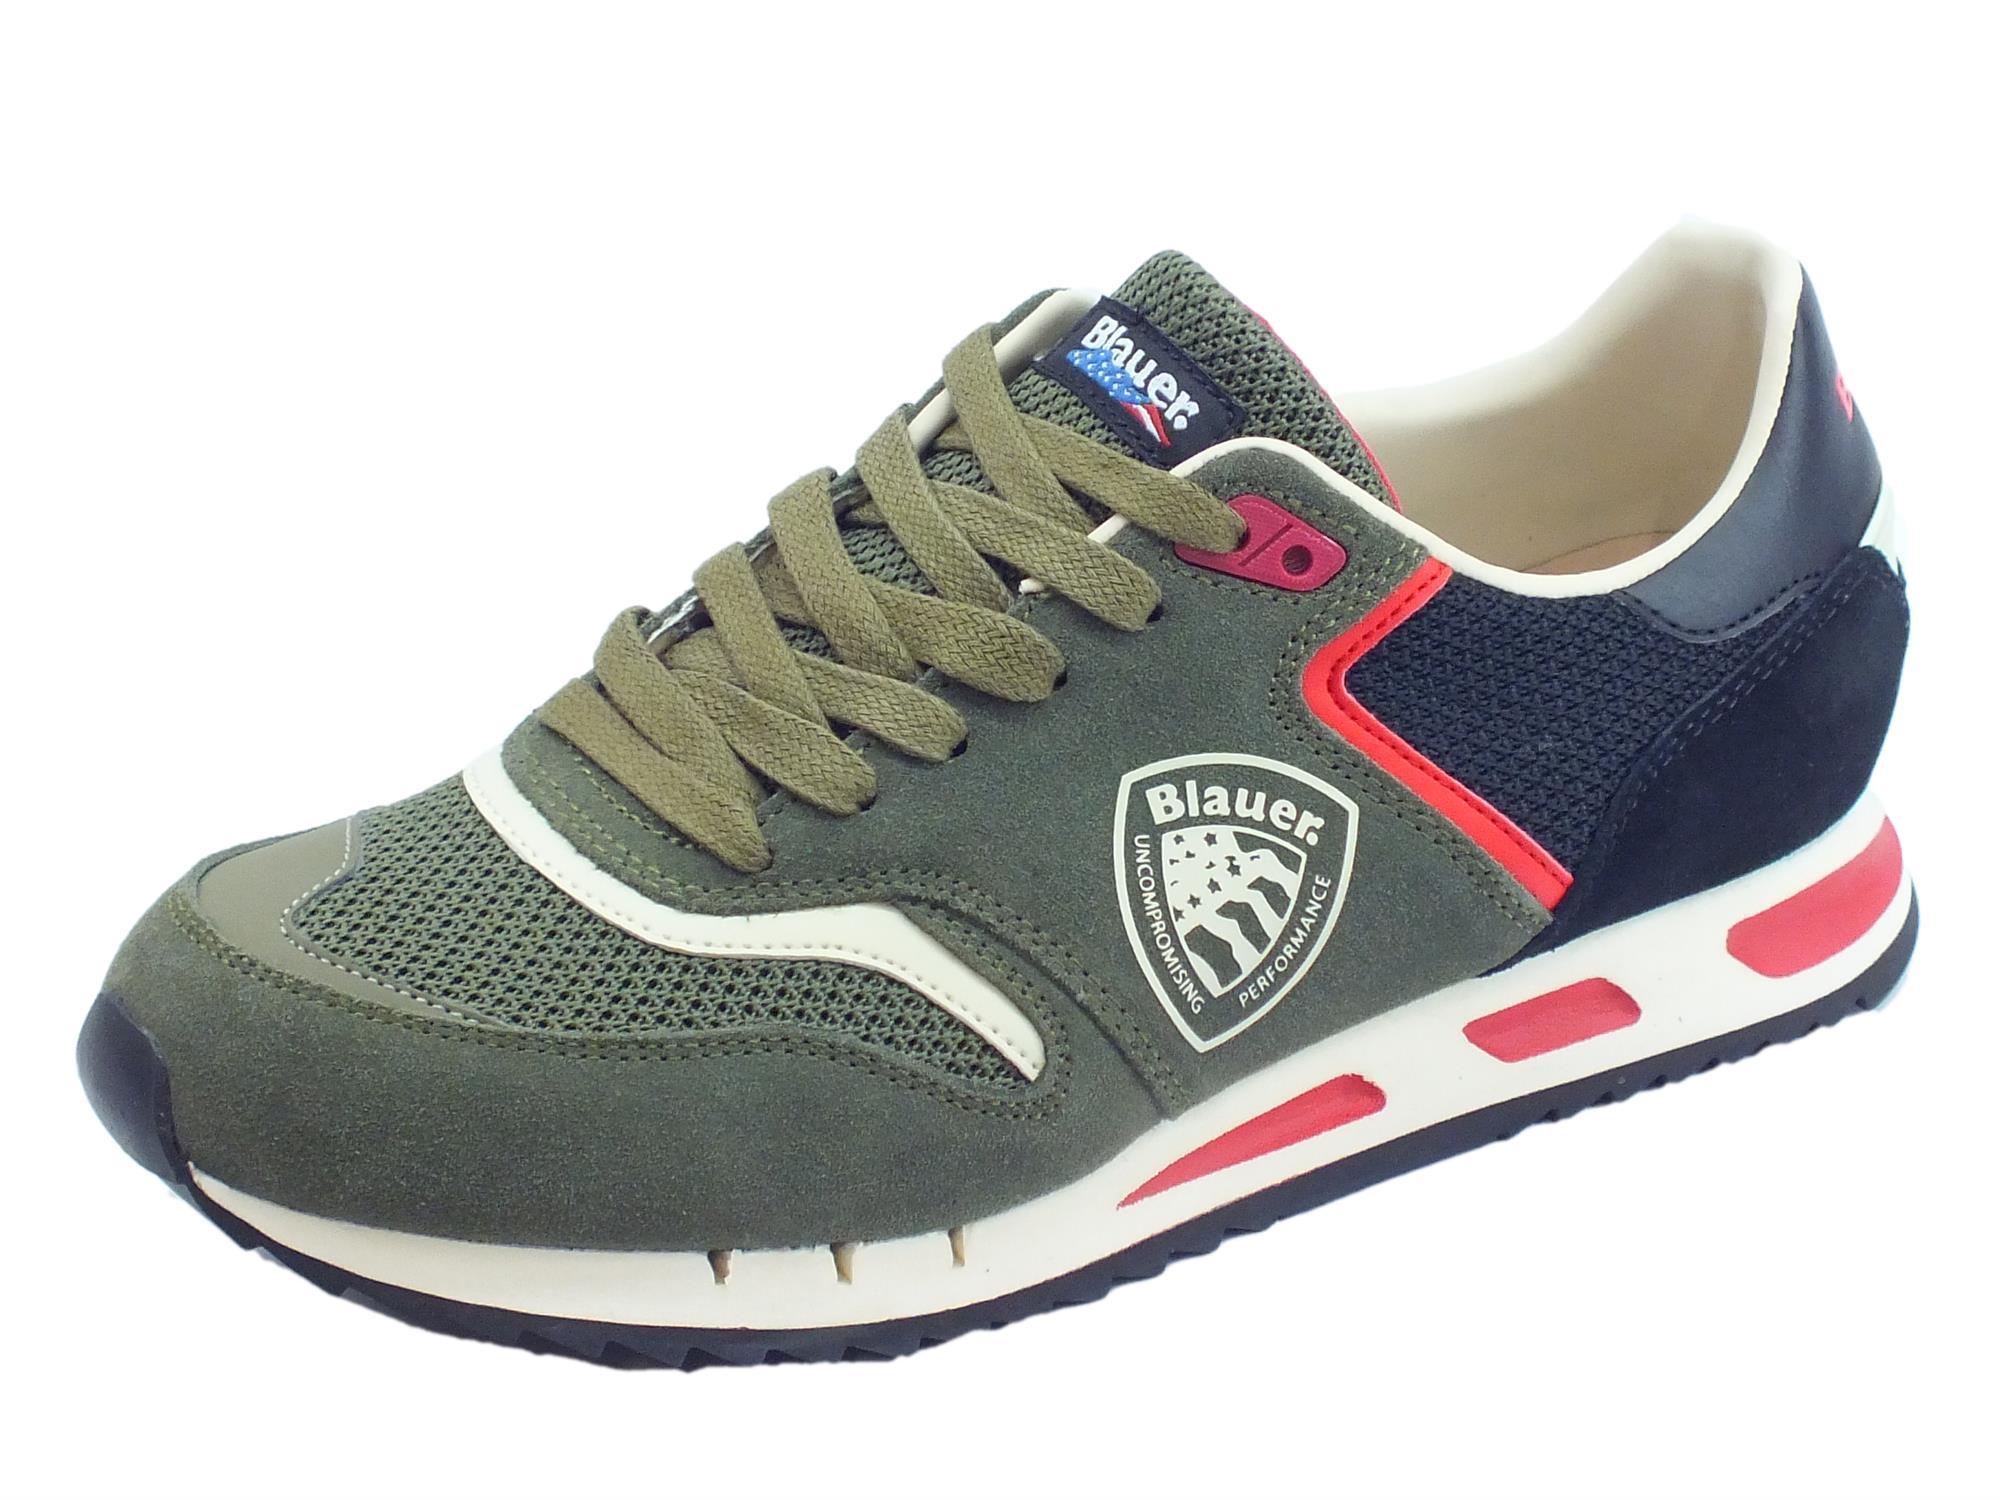 Blauer USA Memphis 06 scarpe sportive uomo military green